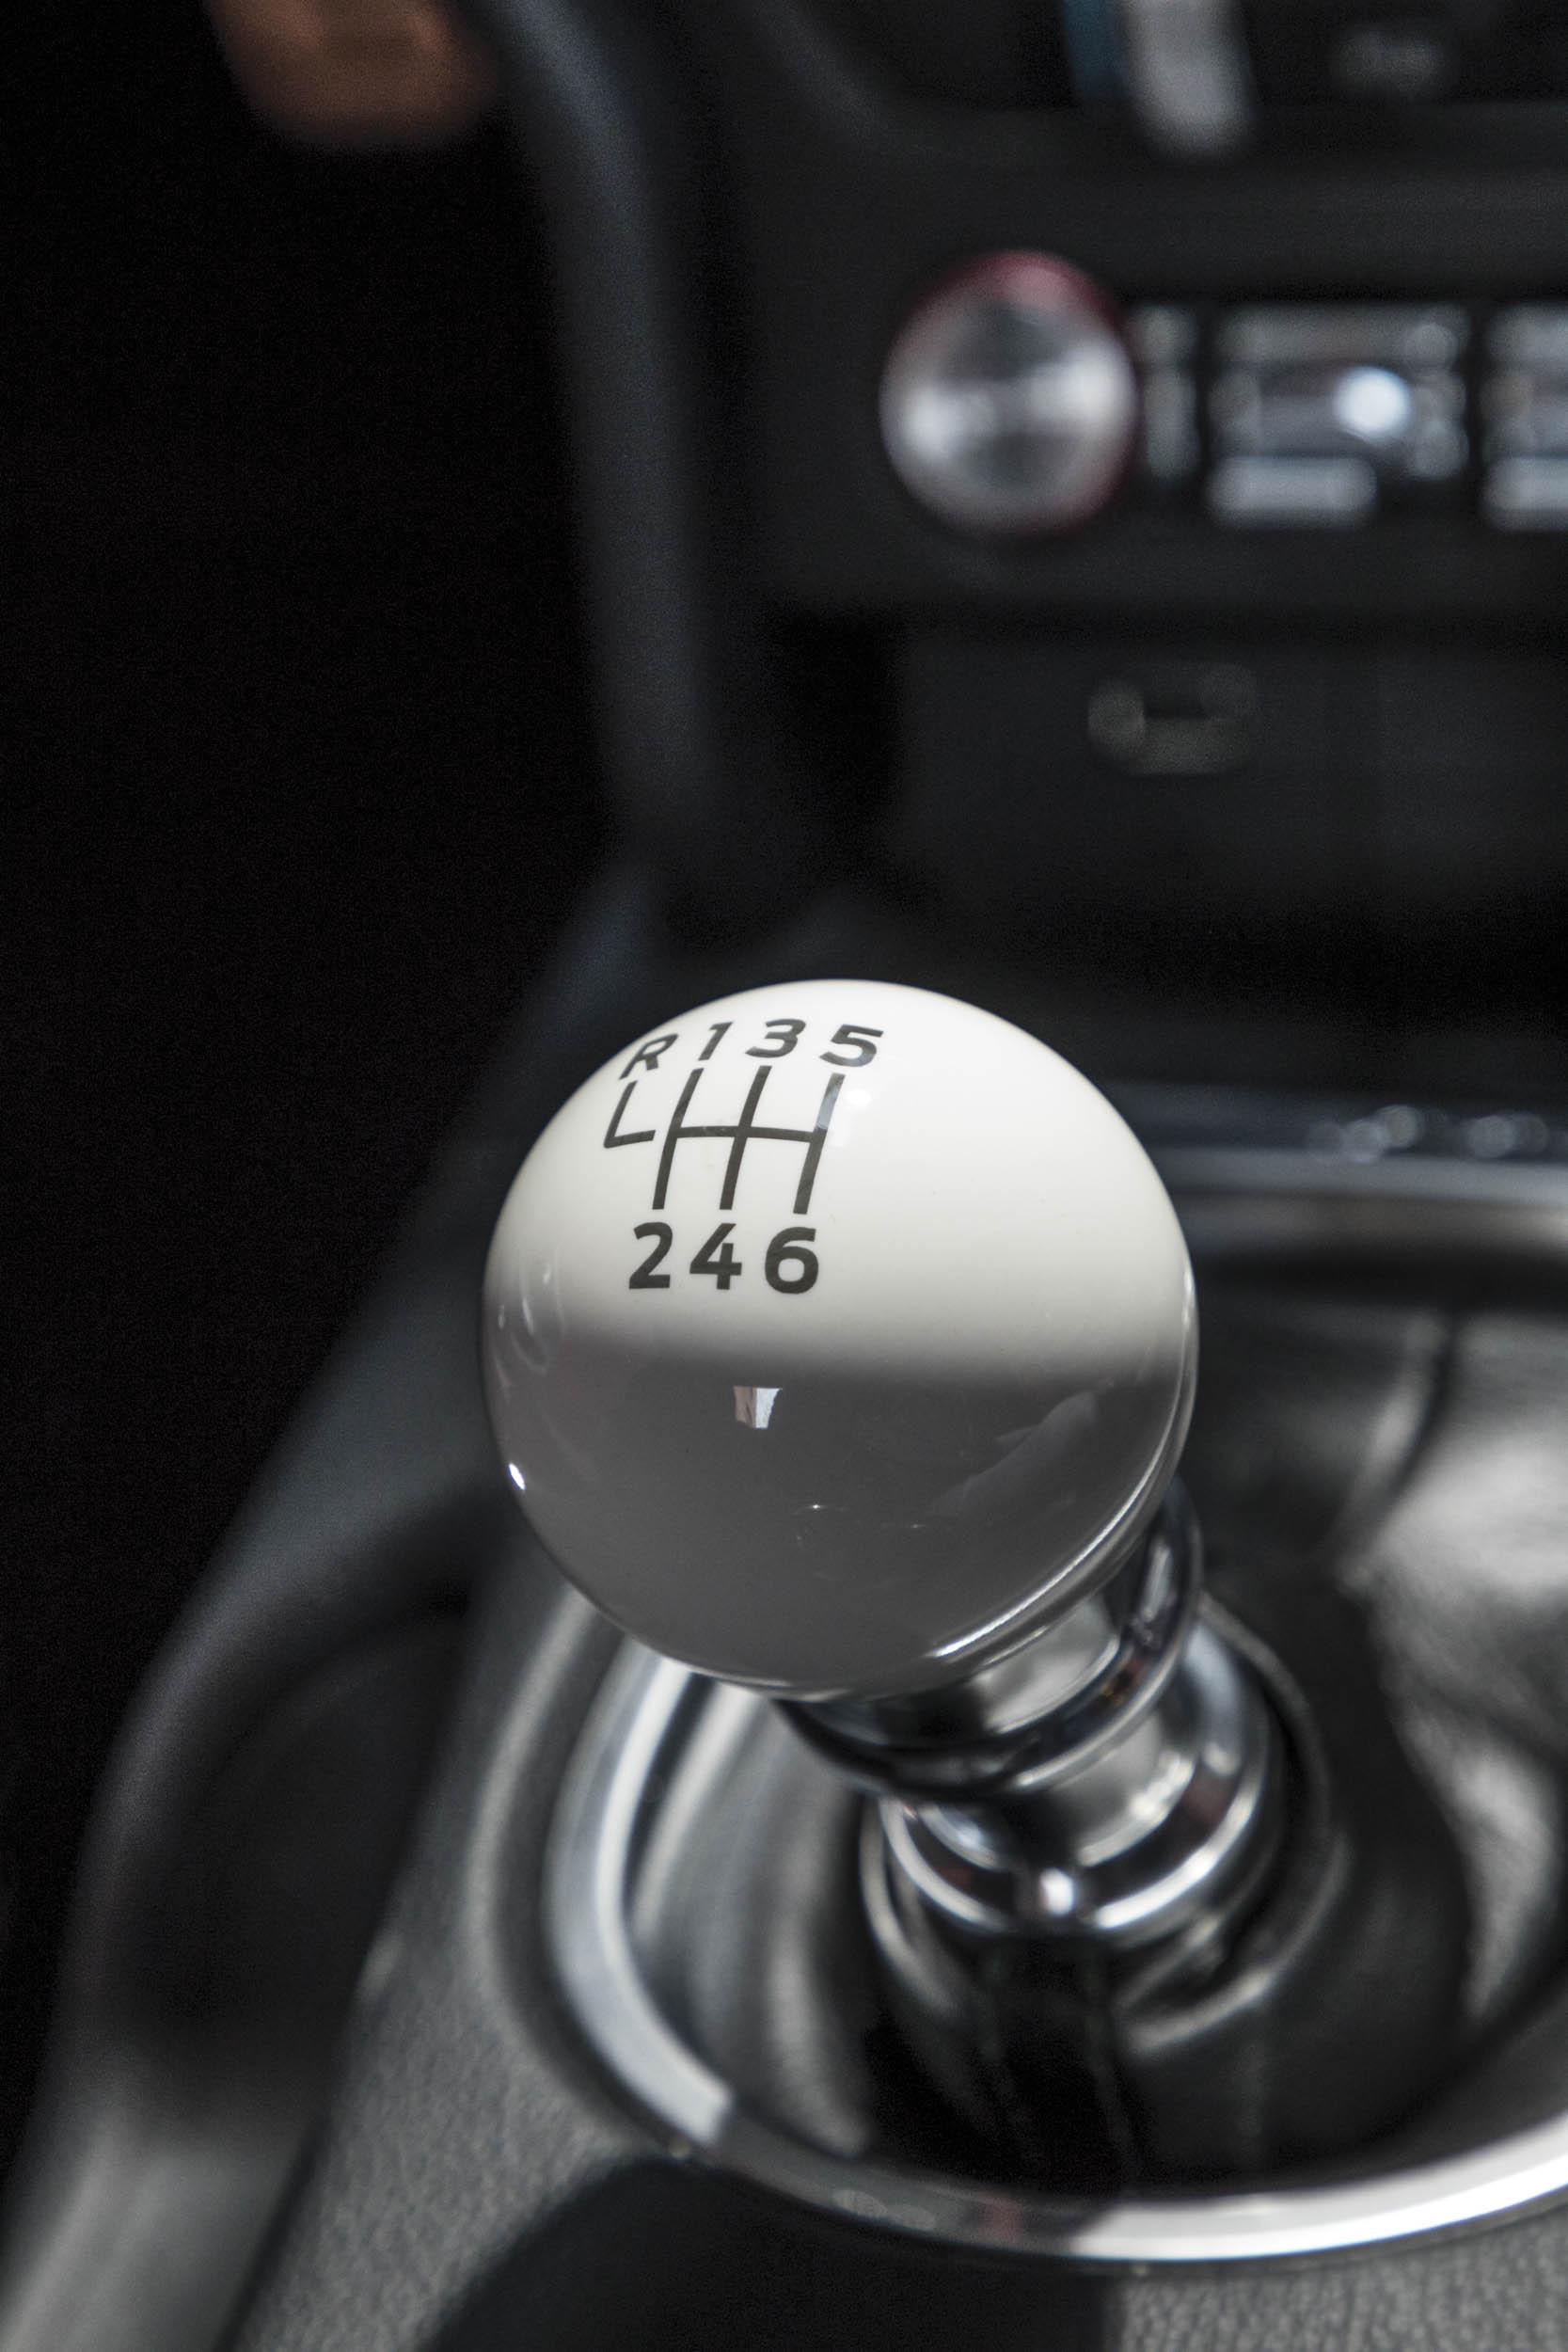 2019 Ford Mustang Bullitt shift knob